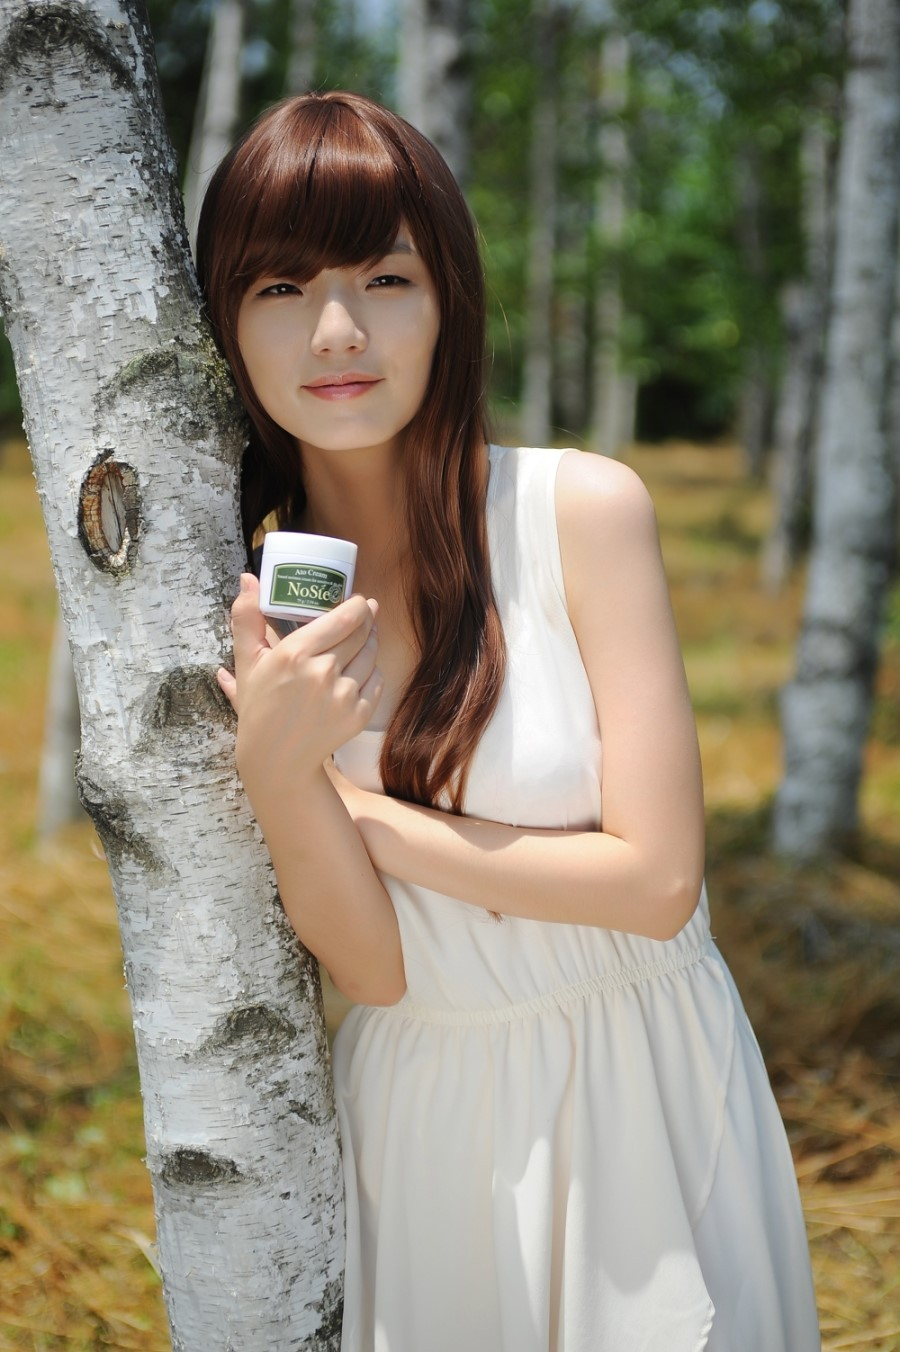 Ahn Young Mi(アン・ヨンミ)のプロフィール ︎【韓国コメディアン】 | BB Crew